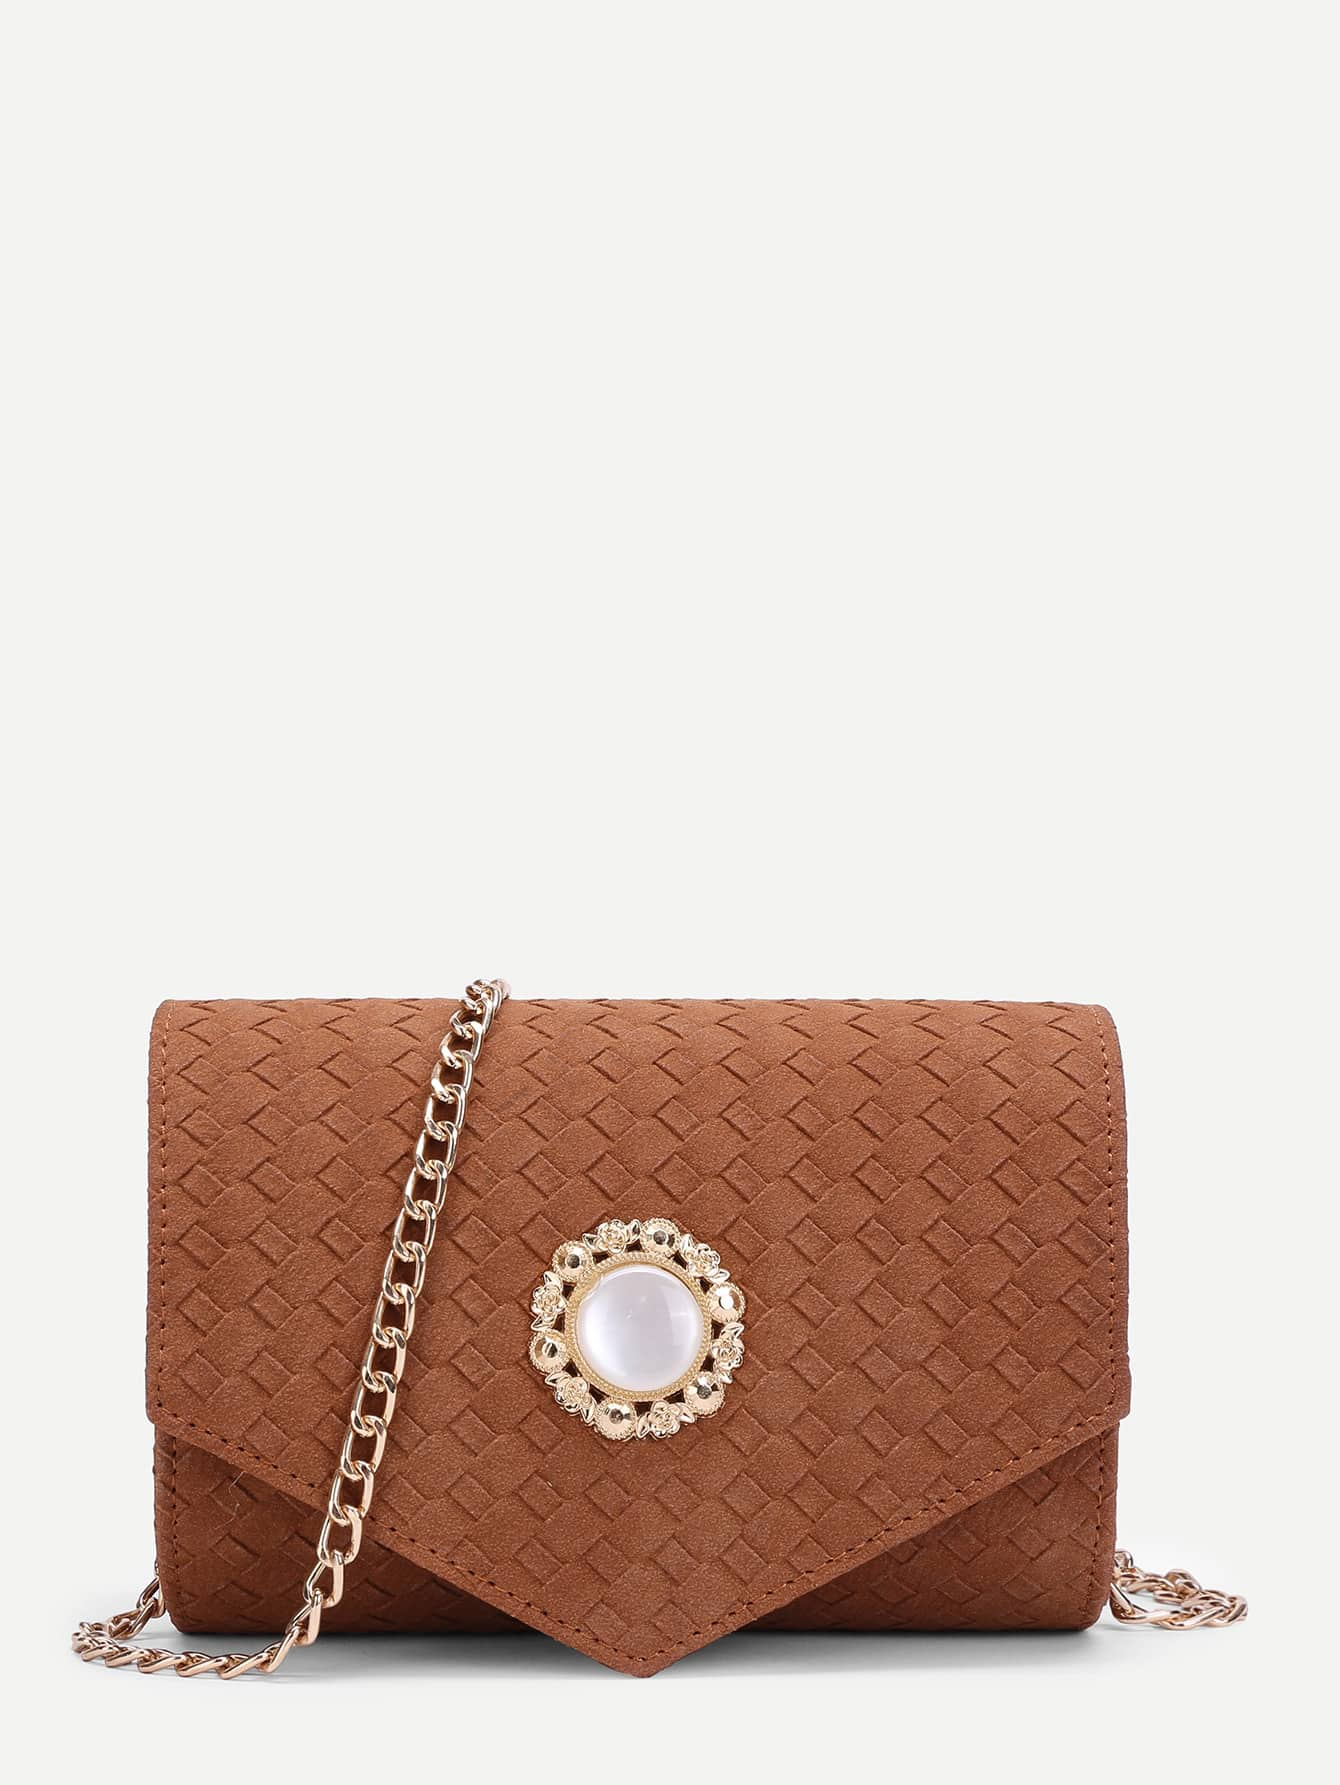 Woven Design Flap Chain Bag With Jewelry карганова е желтик